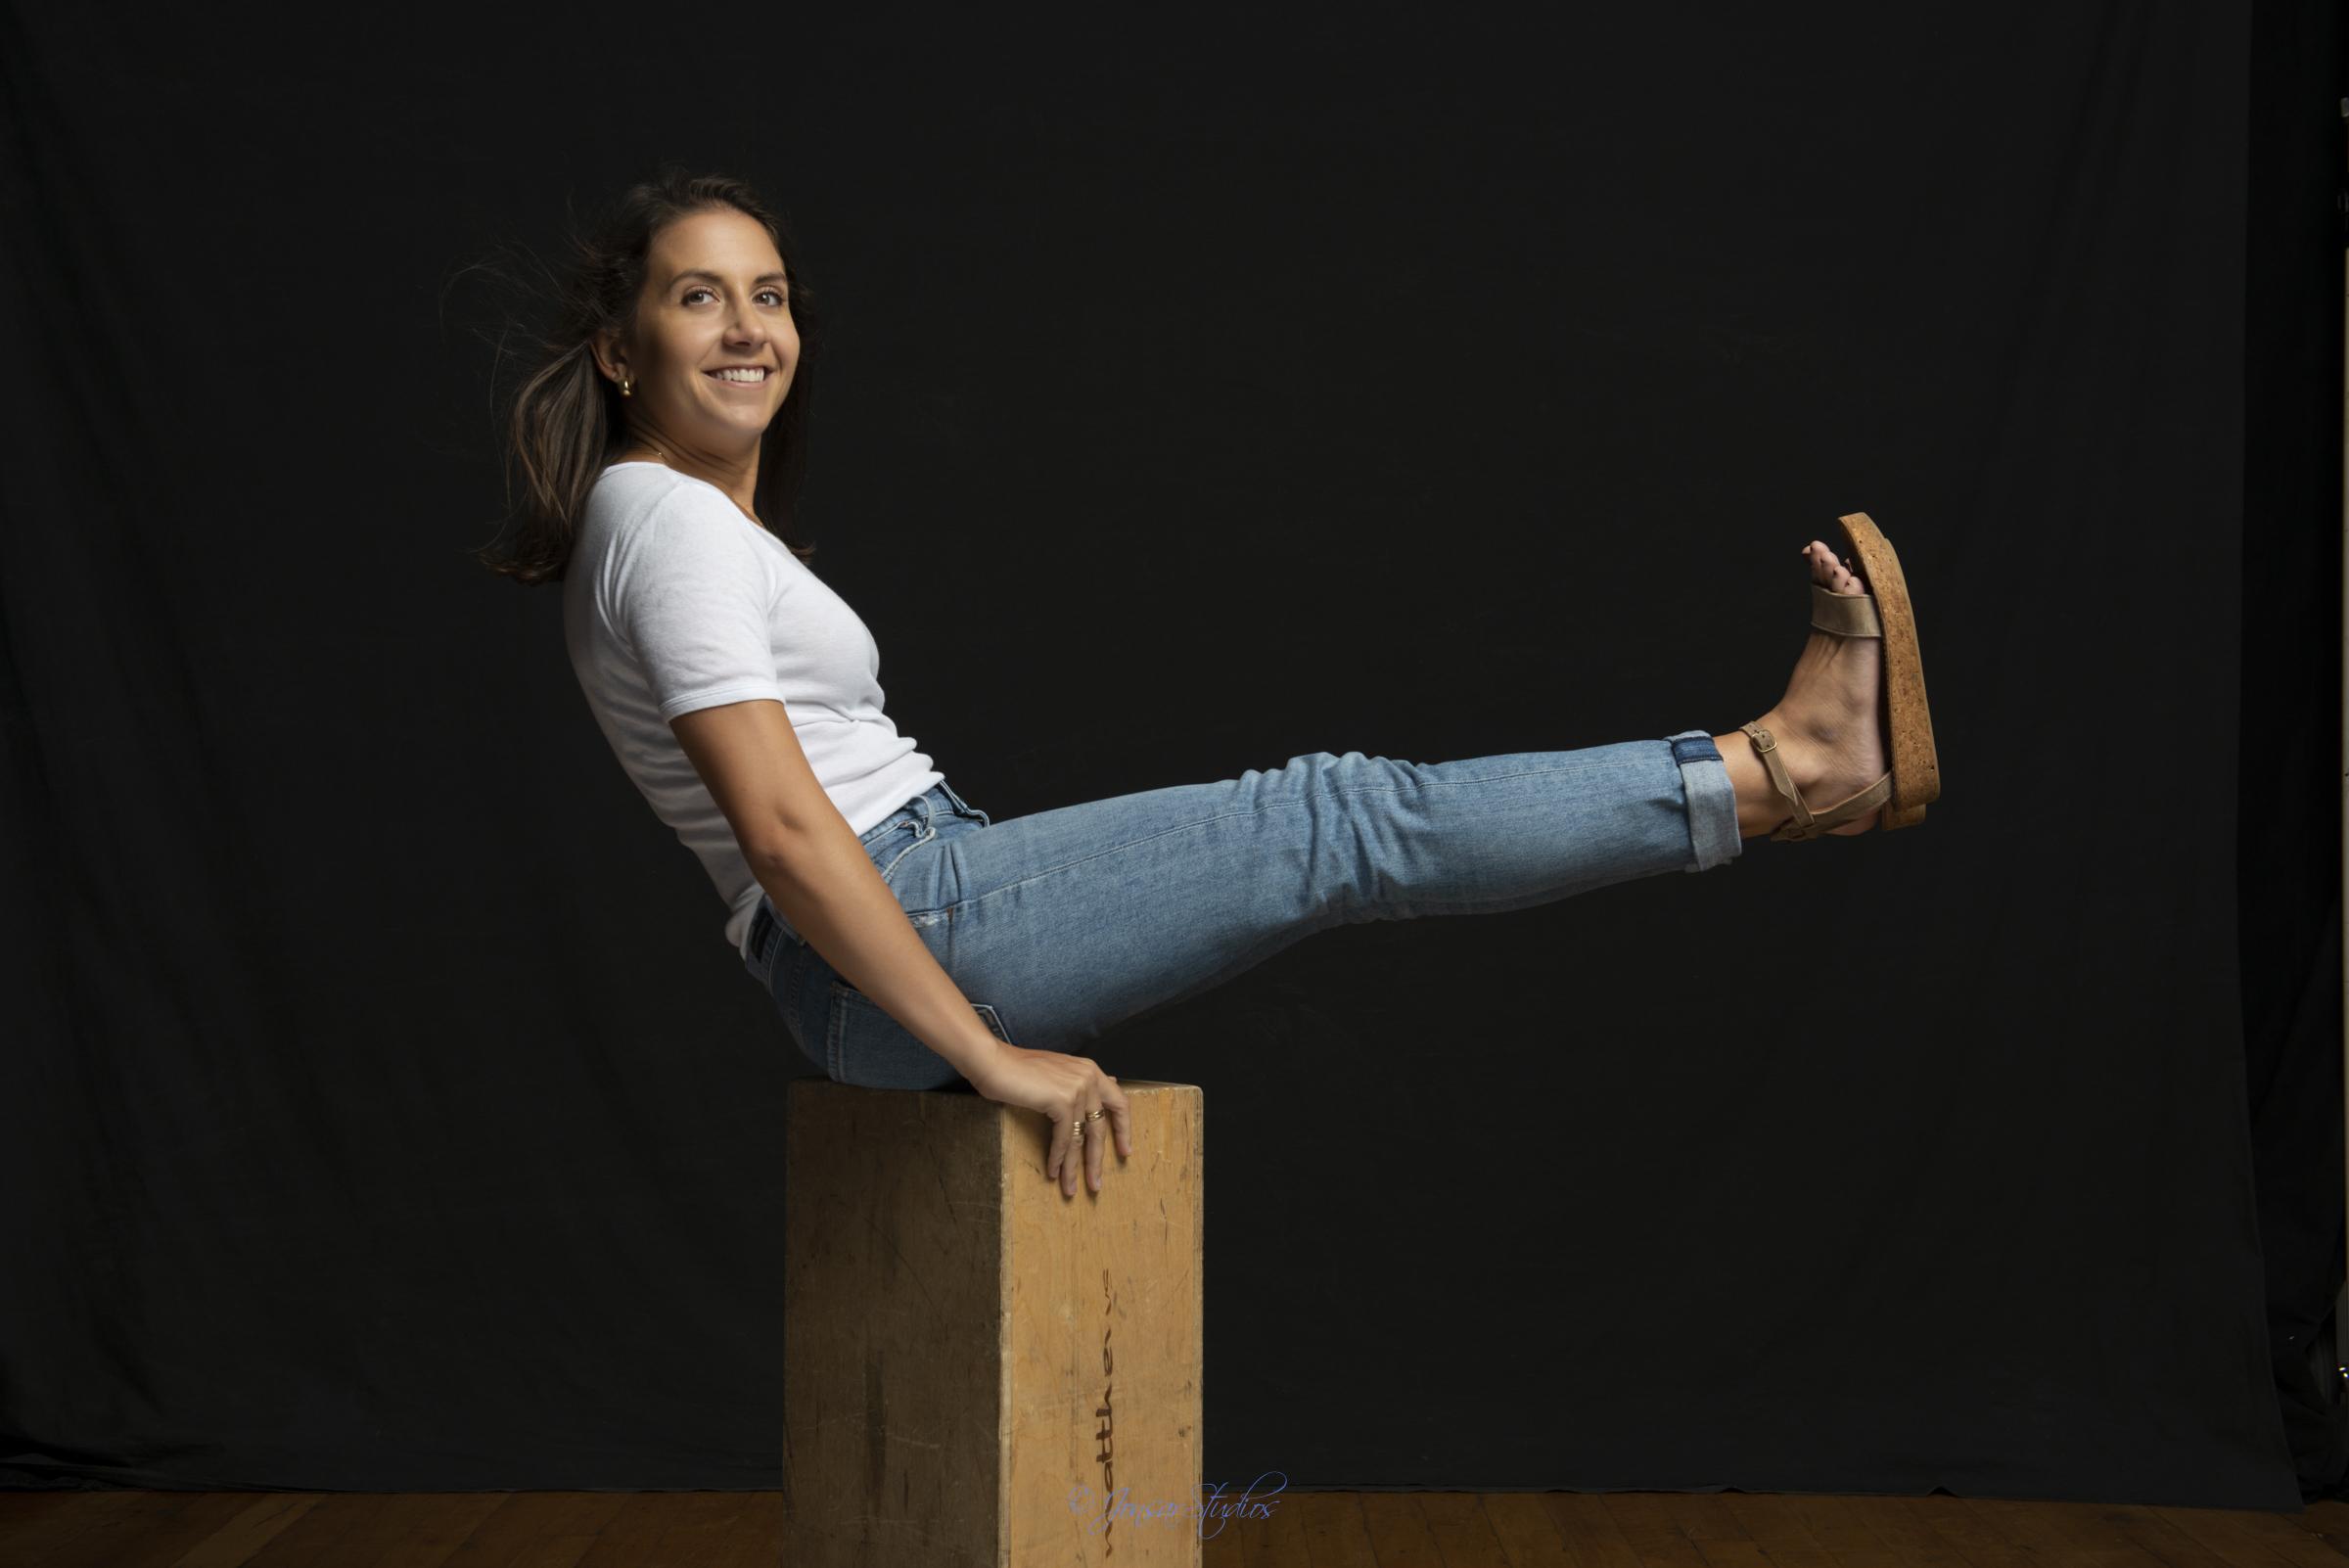 Molly_Shapiro_Balancing_on_Box.jpg